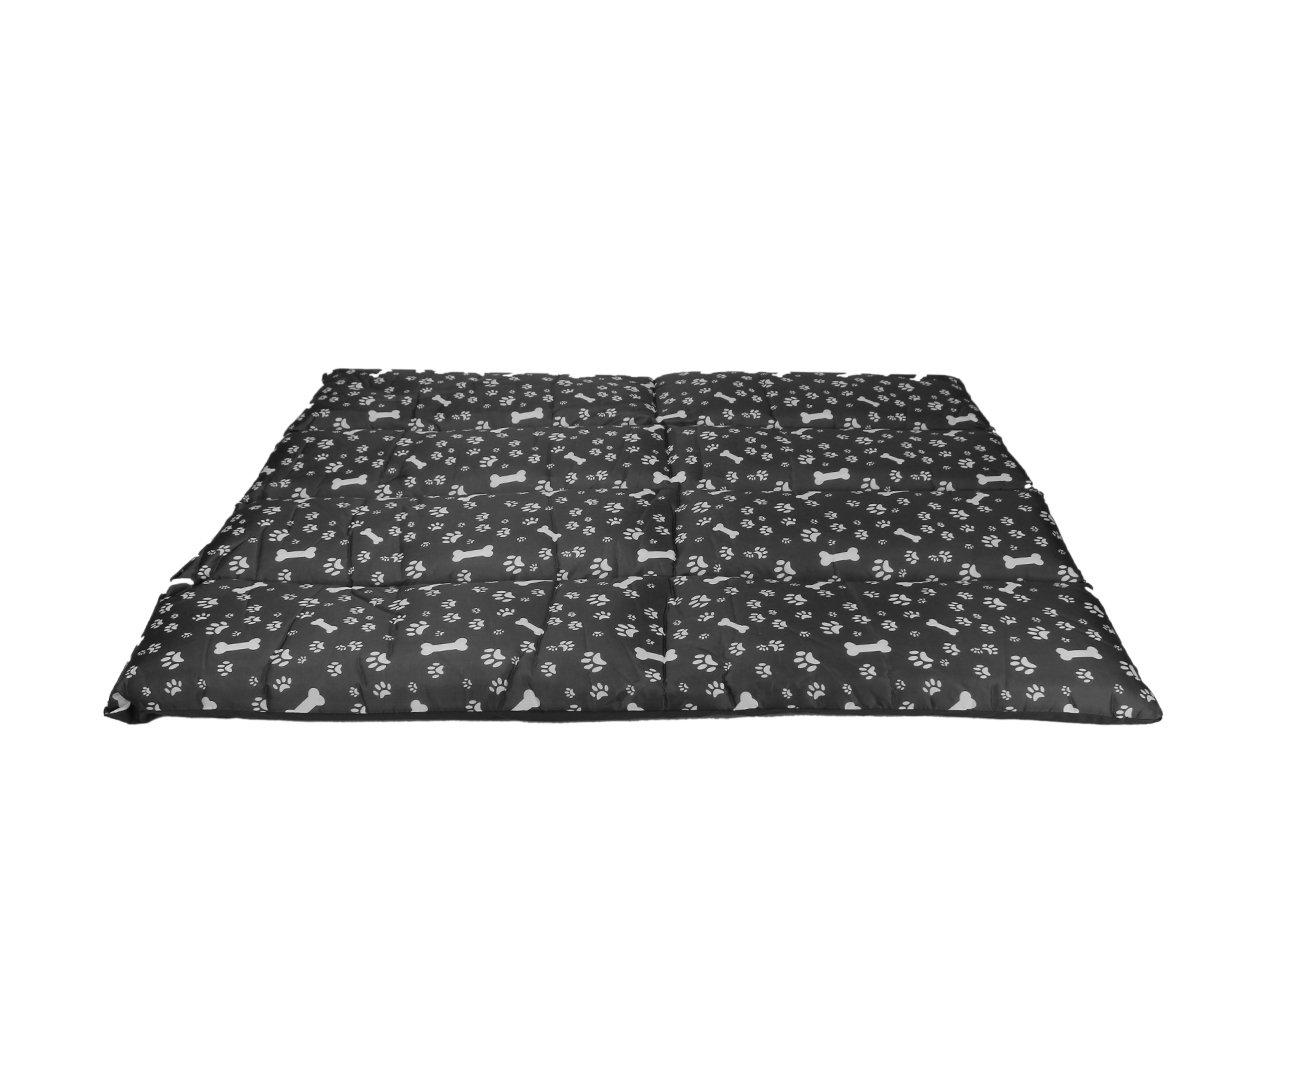 Almofada De Nylon N4 Preta - Gg - Furacão